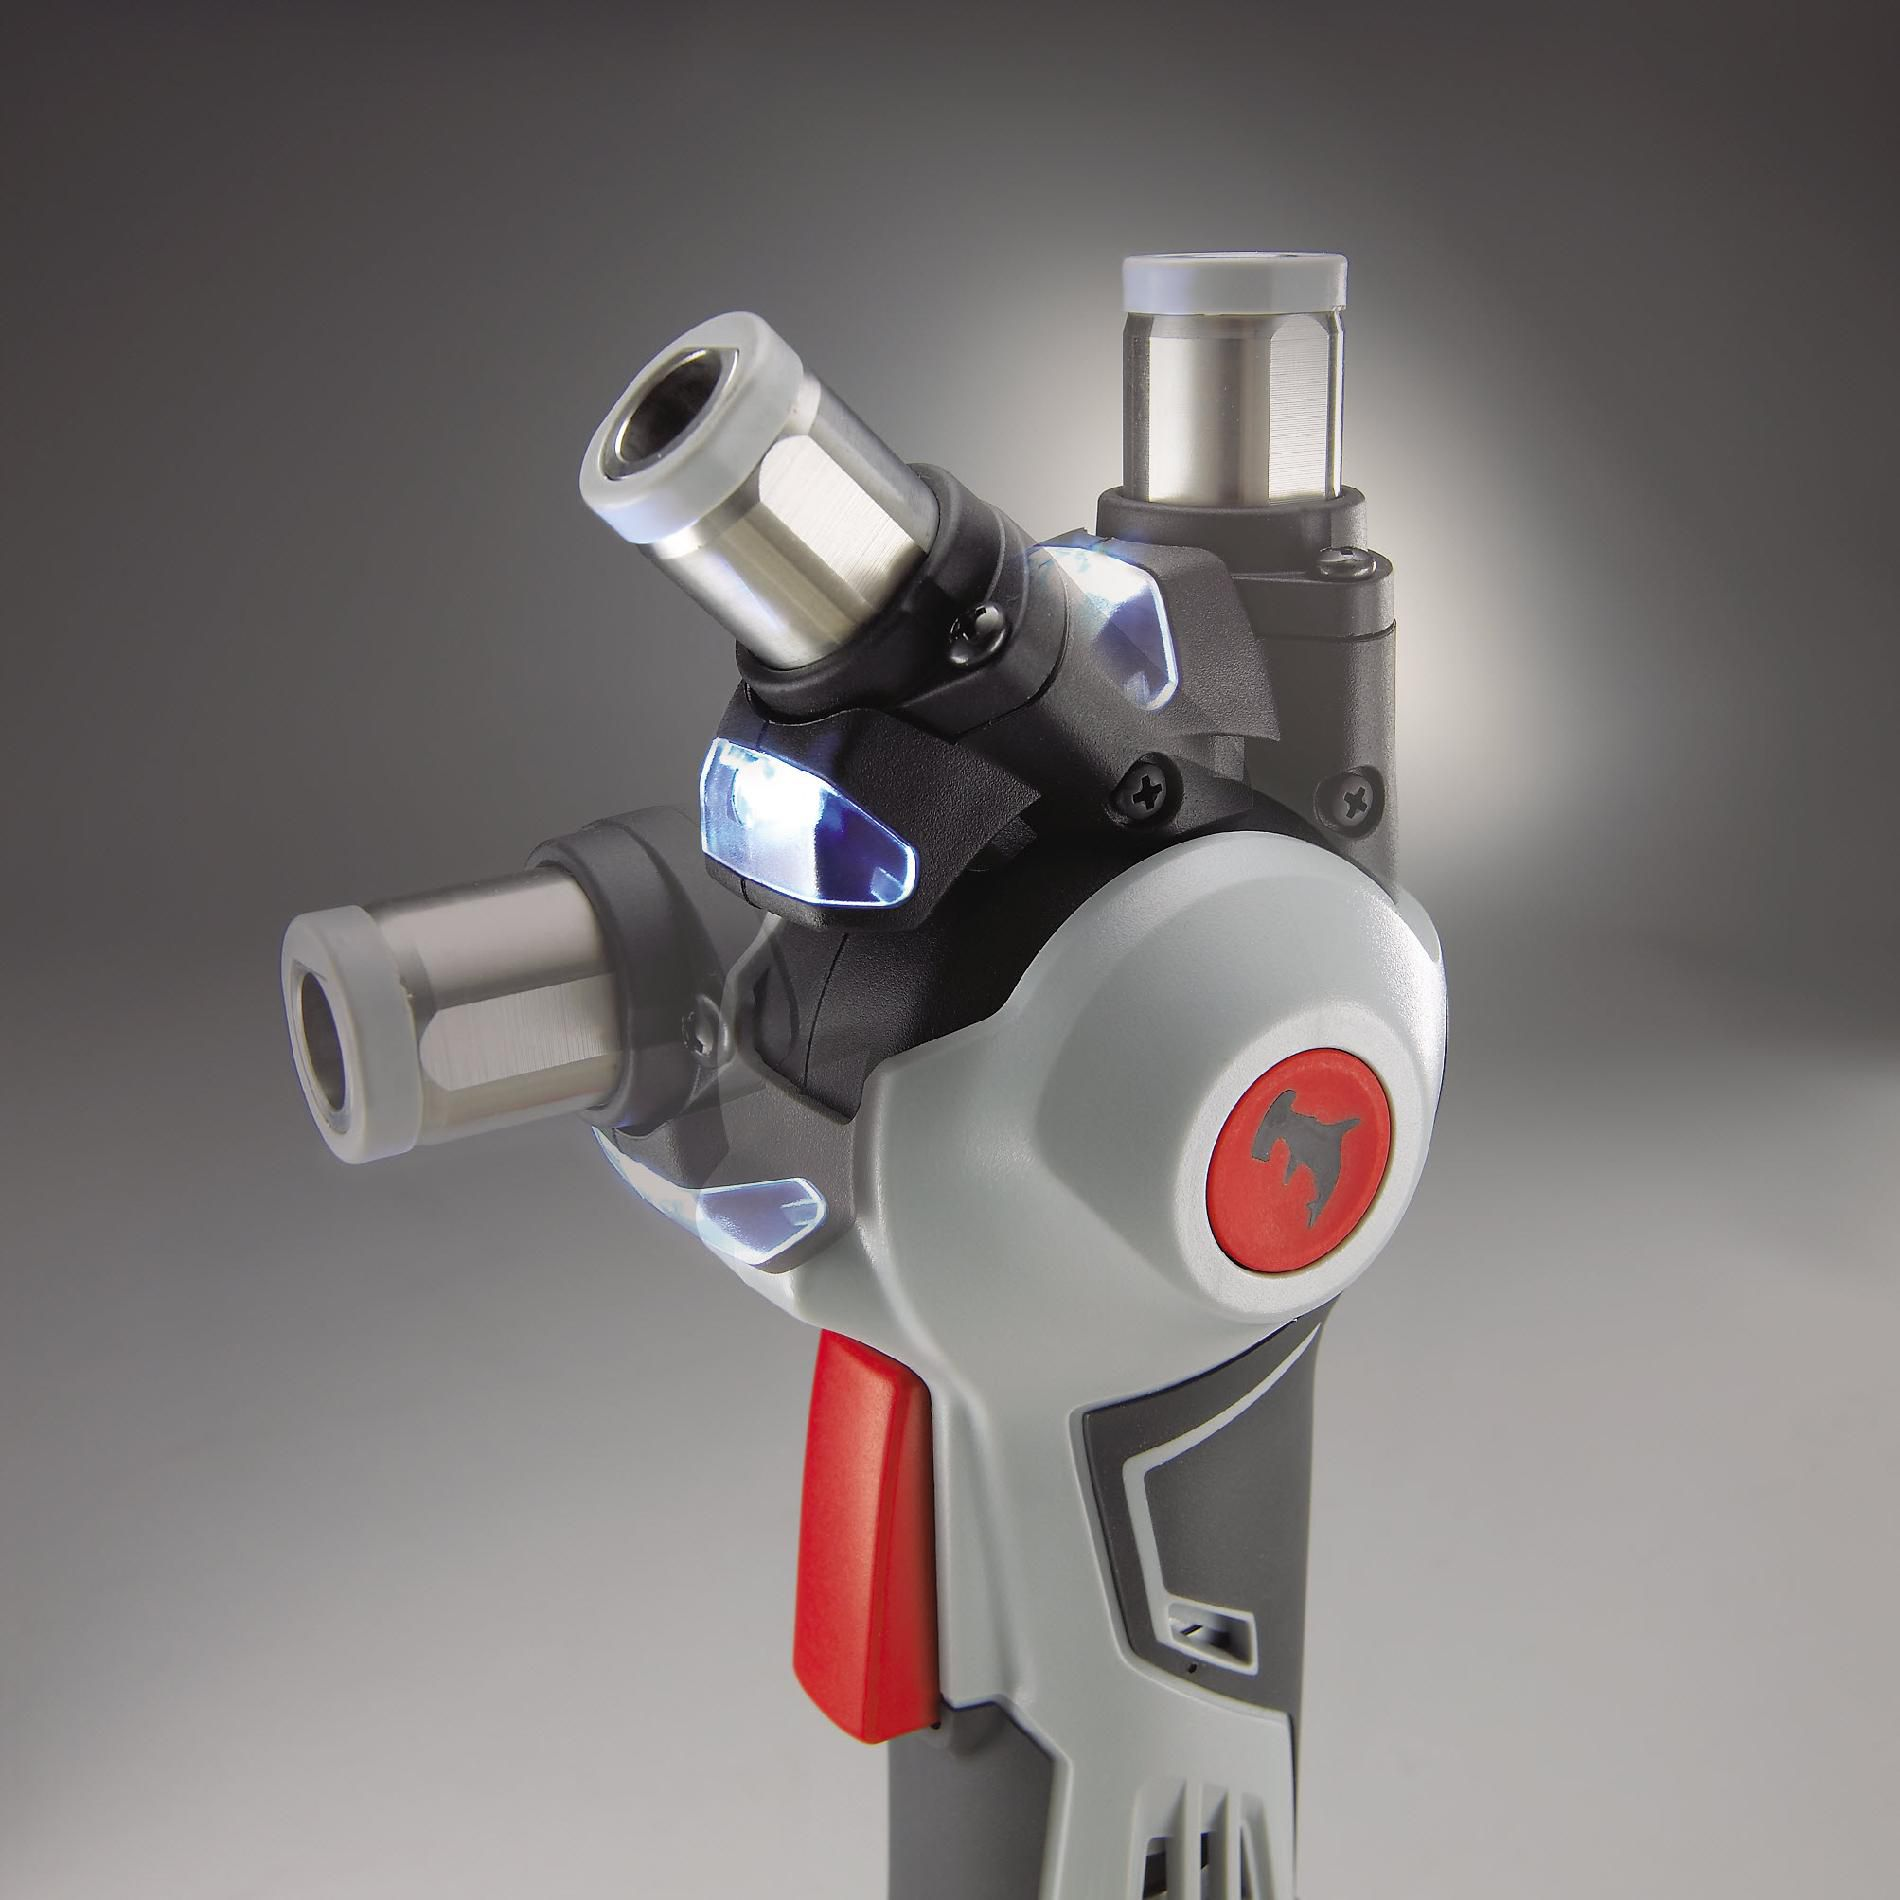 Craftsman NEXTEC 12.0 Volt  Hammerhead Auto Hammer with Rotating Head